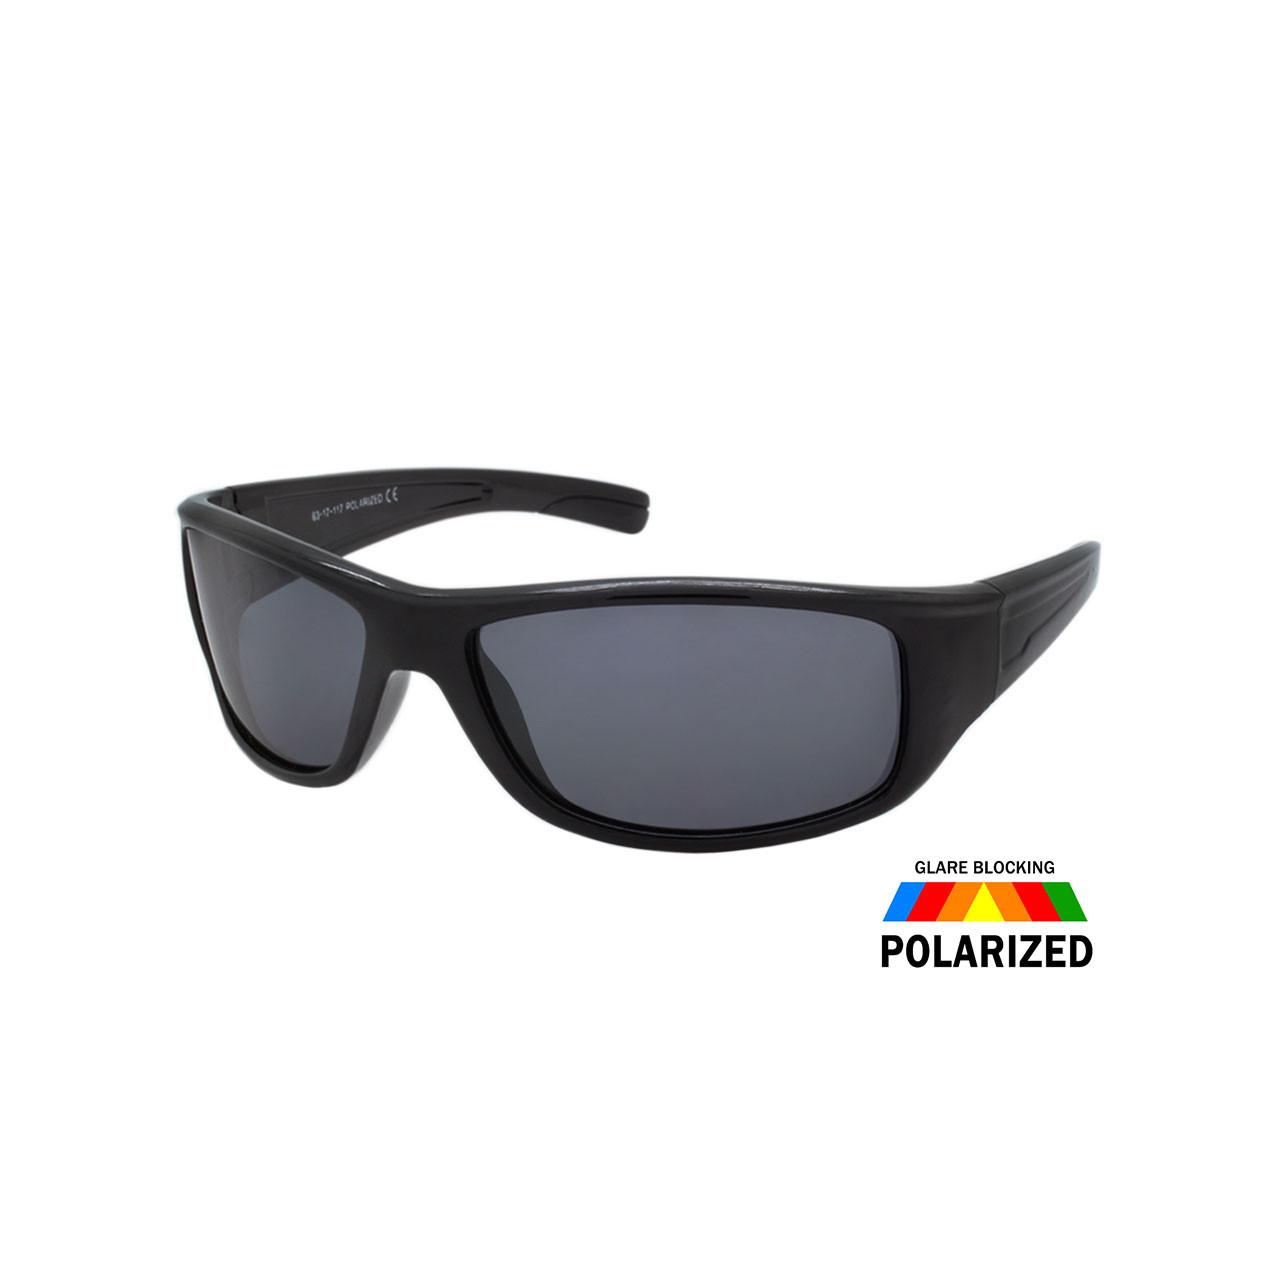 47111ff606f Wholesale Assorted Colors Polycarbonate Polarized Sport Wrap ...